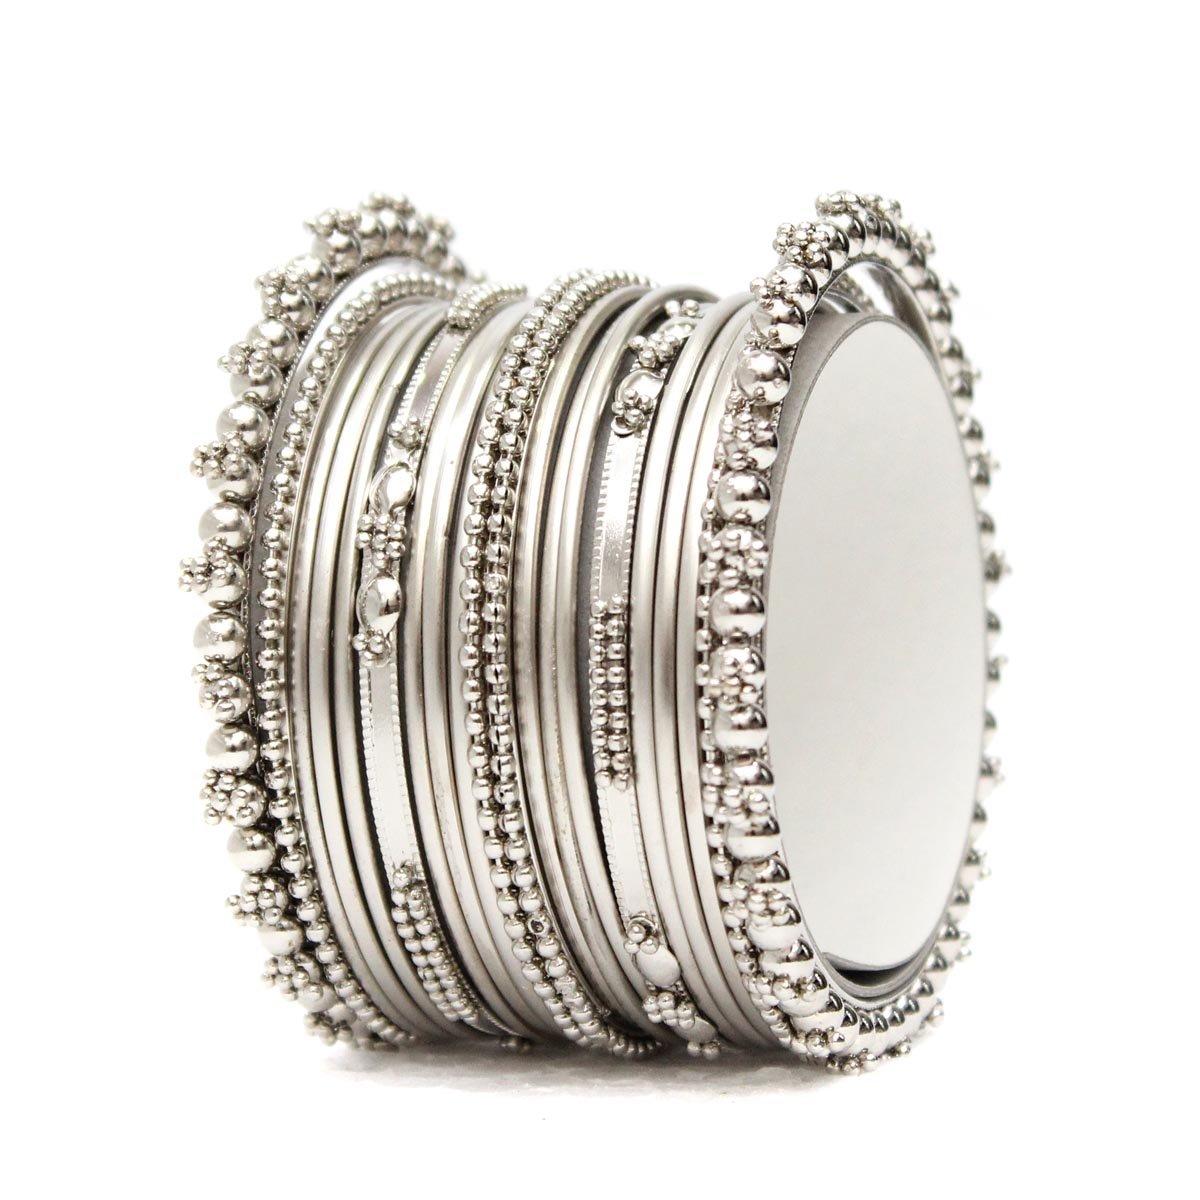 SANARA Antique Bollywood Style Silver Tone Bangle Bracelst Set 1 Pc Indian Jewelry (2.6)